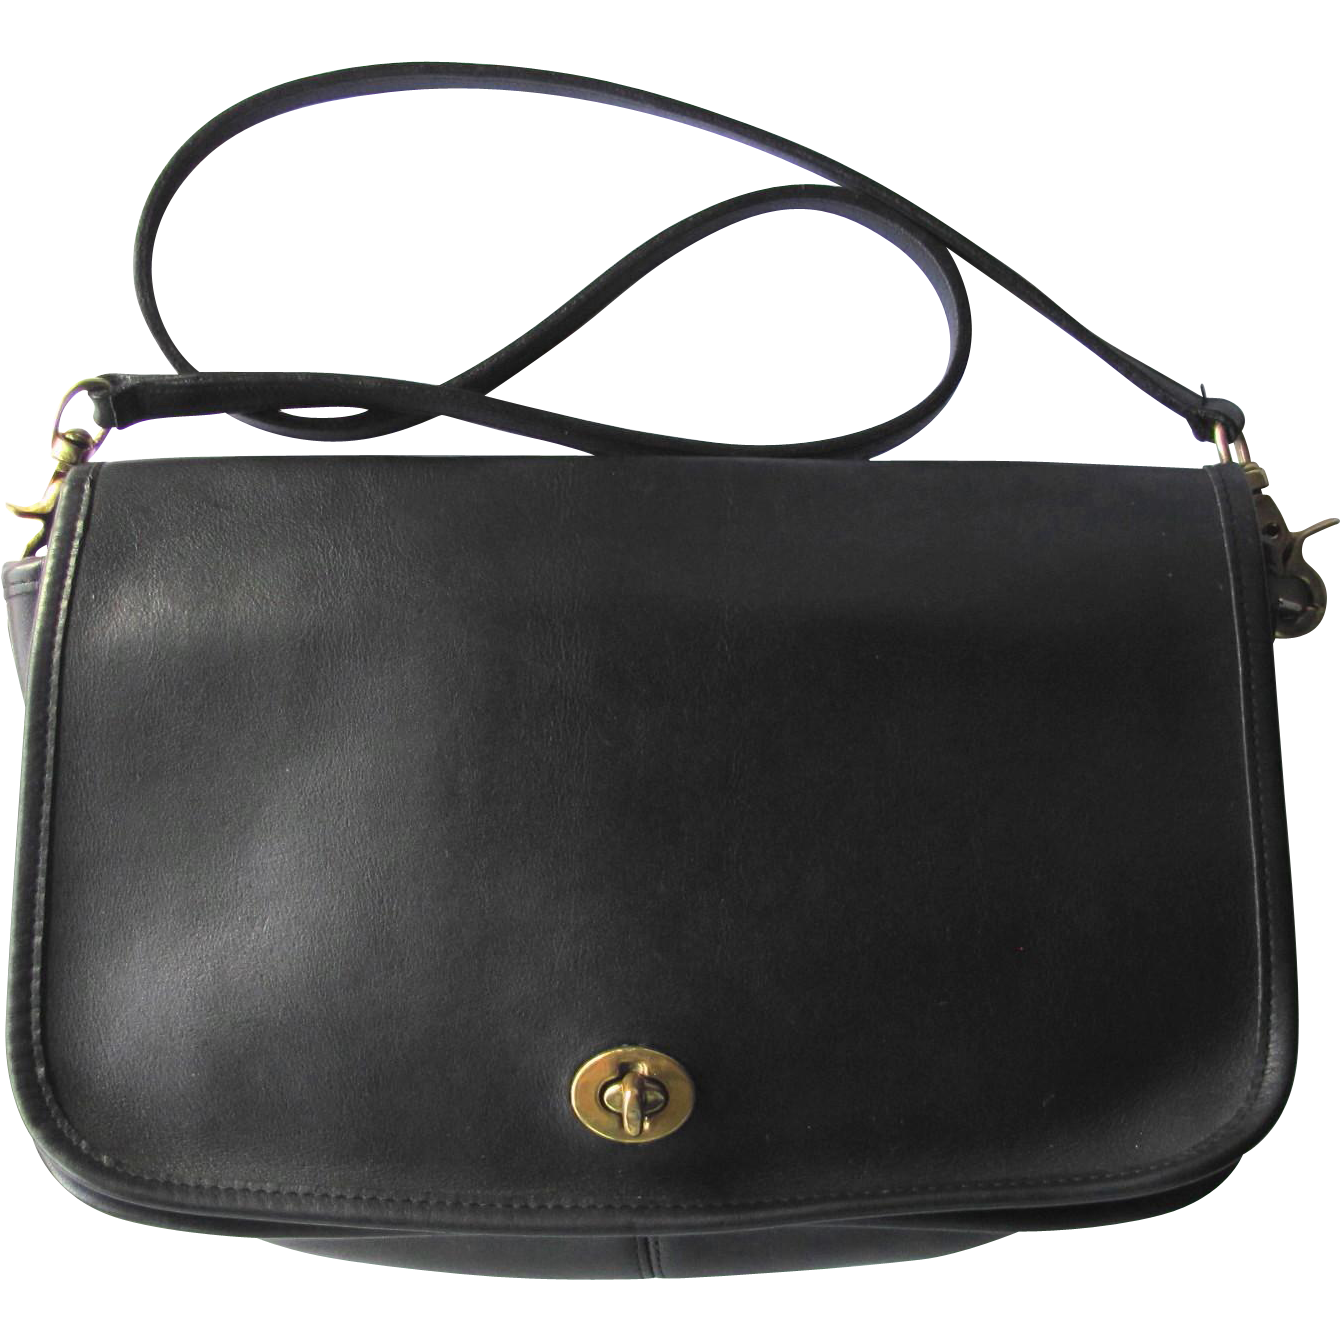 Vintage Coach Black Leather Saddle Bag – New York City Bag from Original Coach Factory